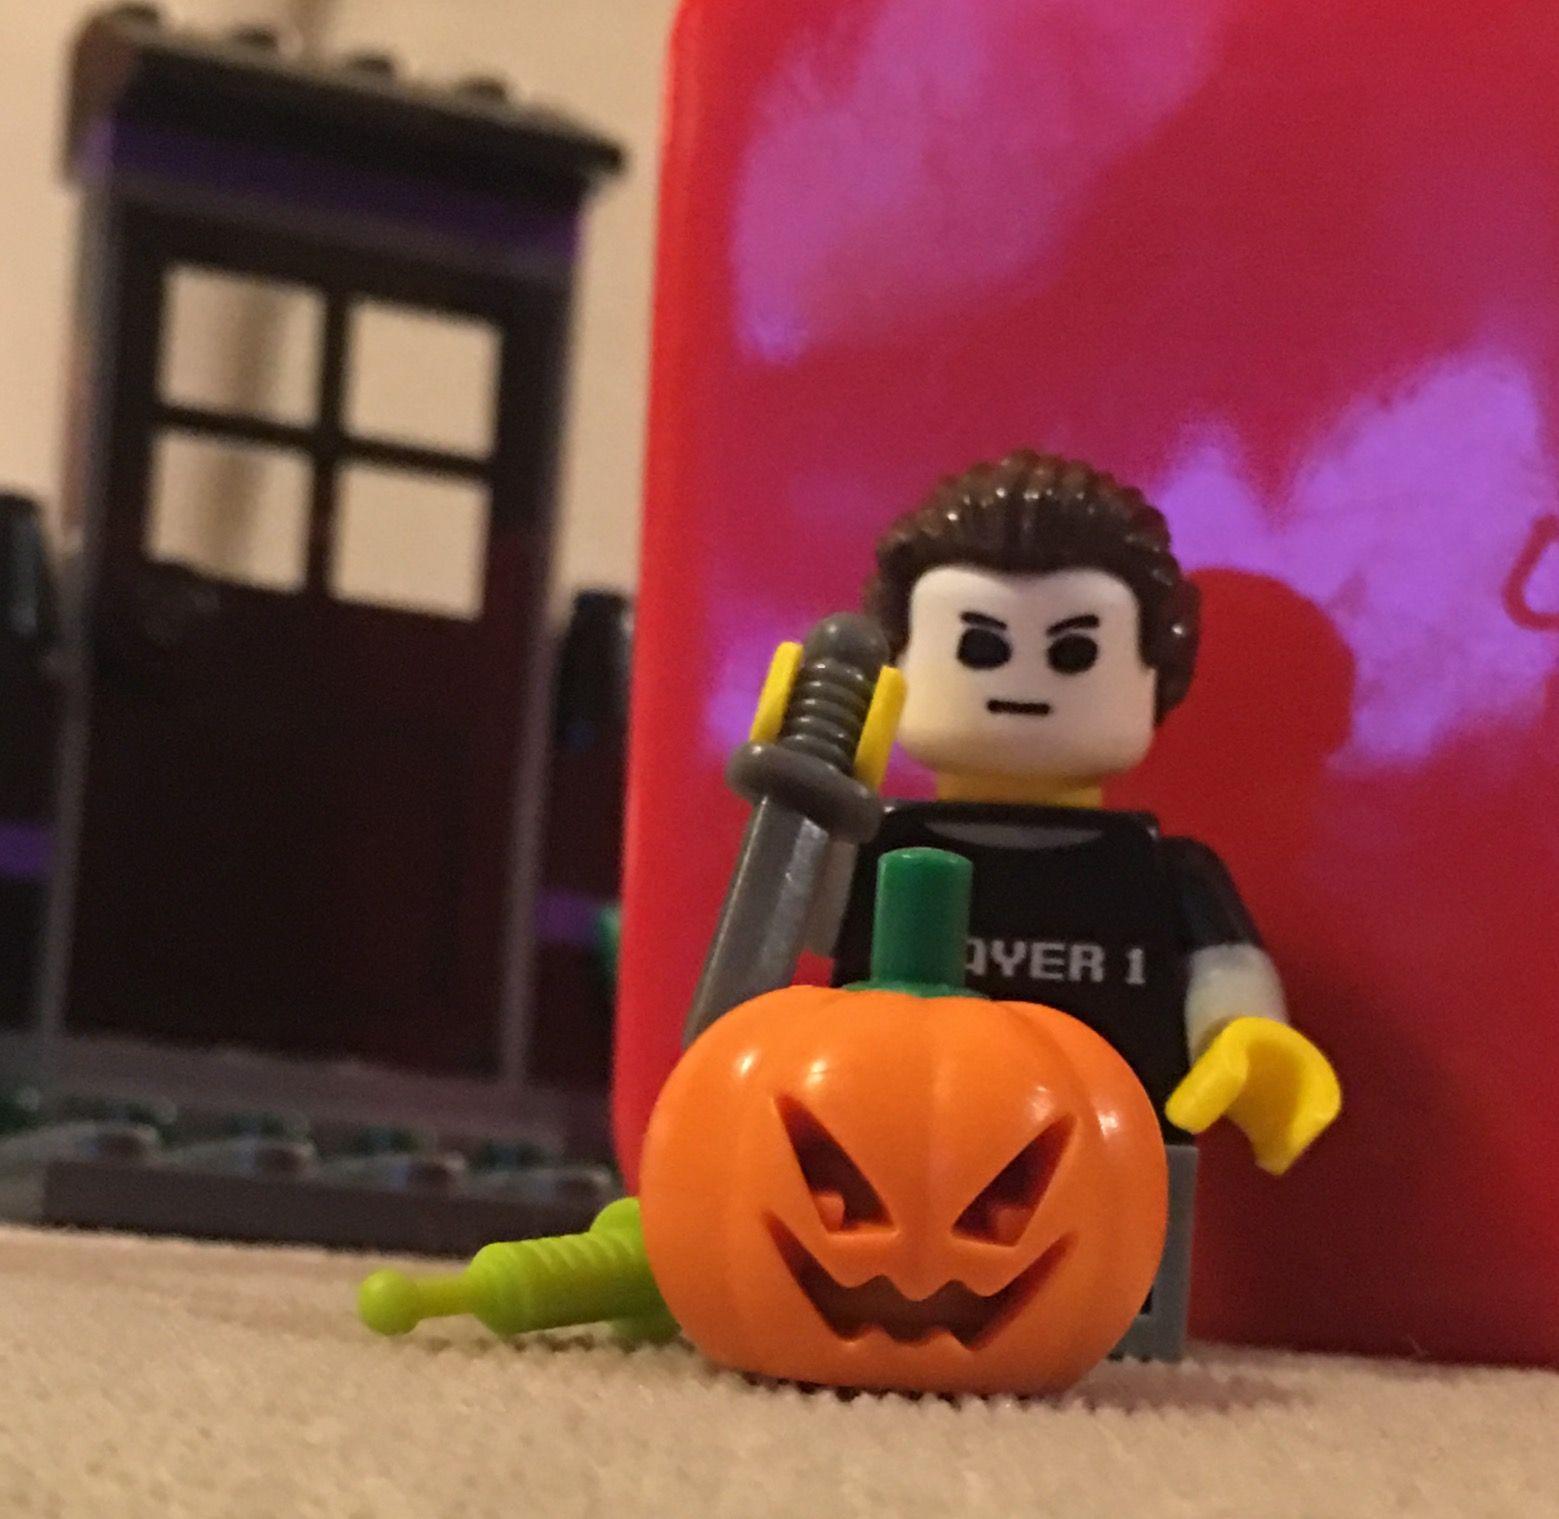 Pin by Valerie on Halloween Michael myers halloween